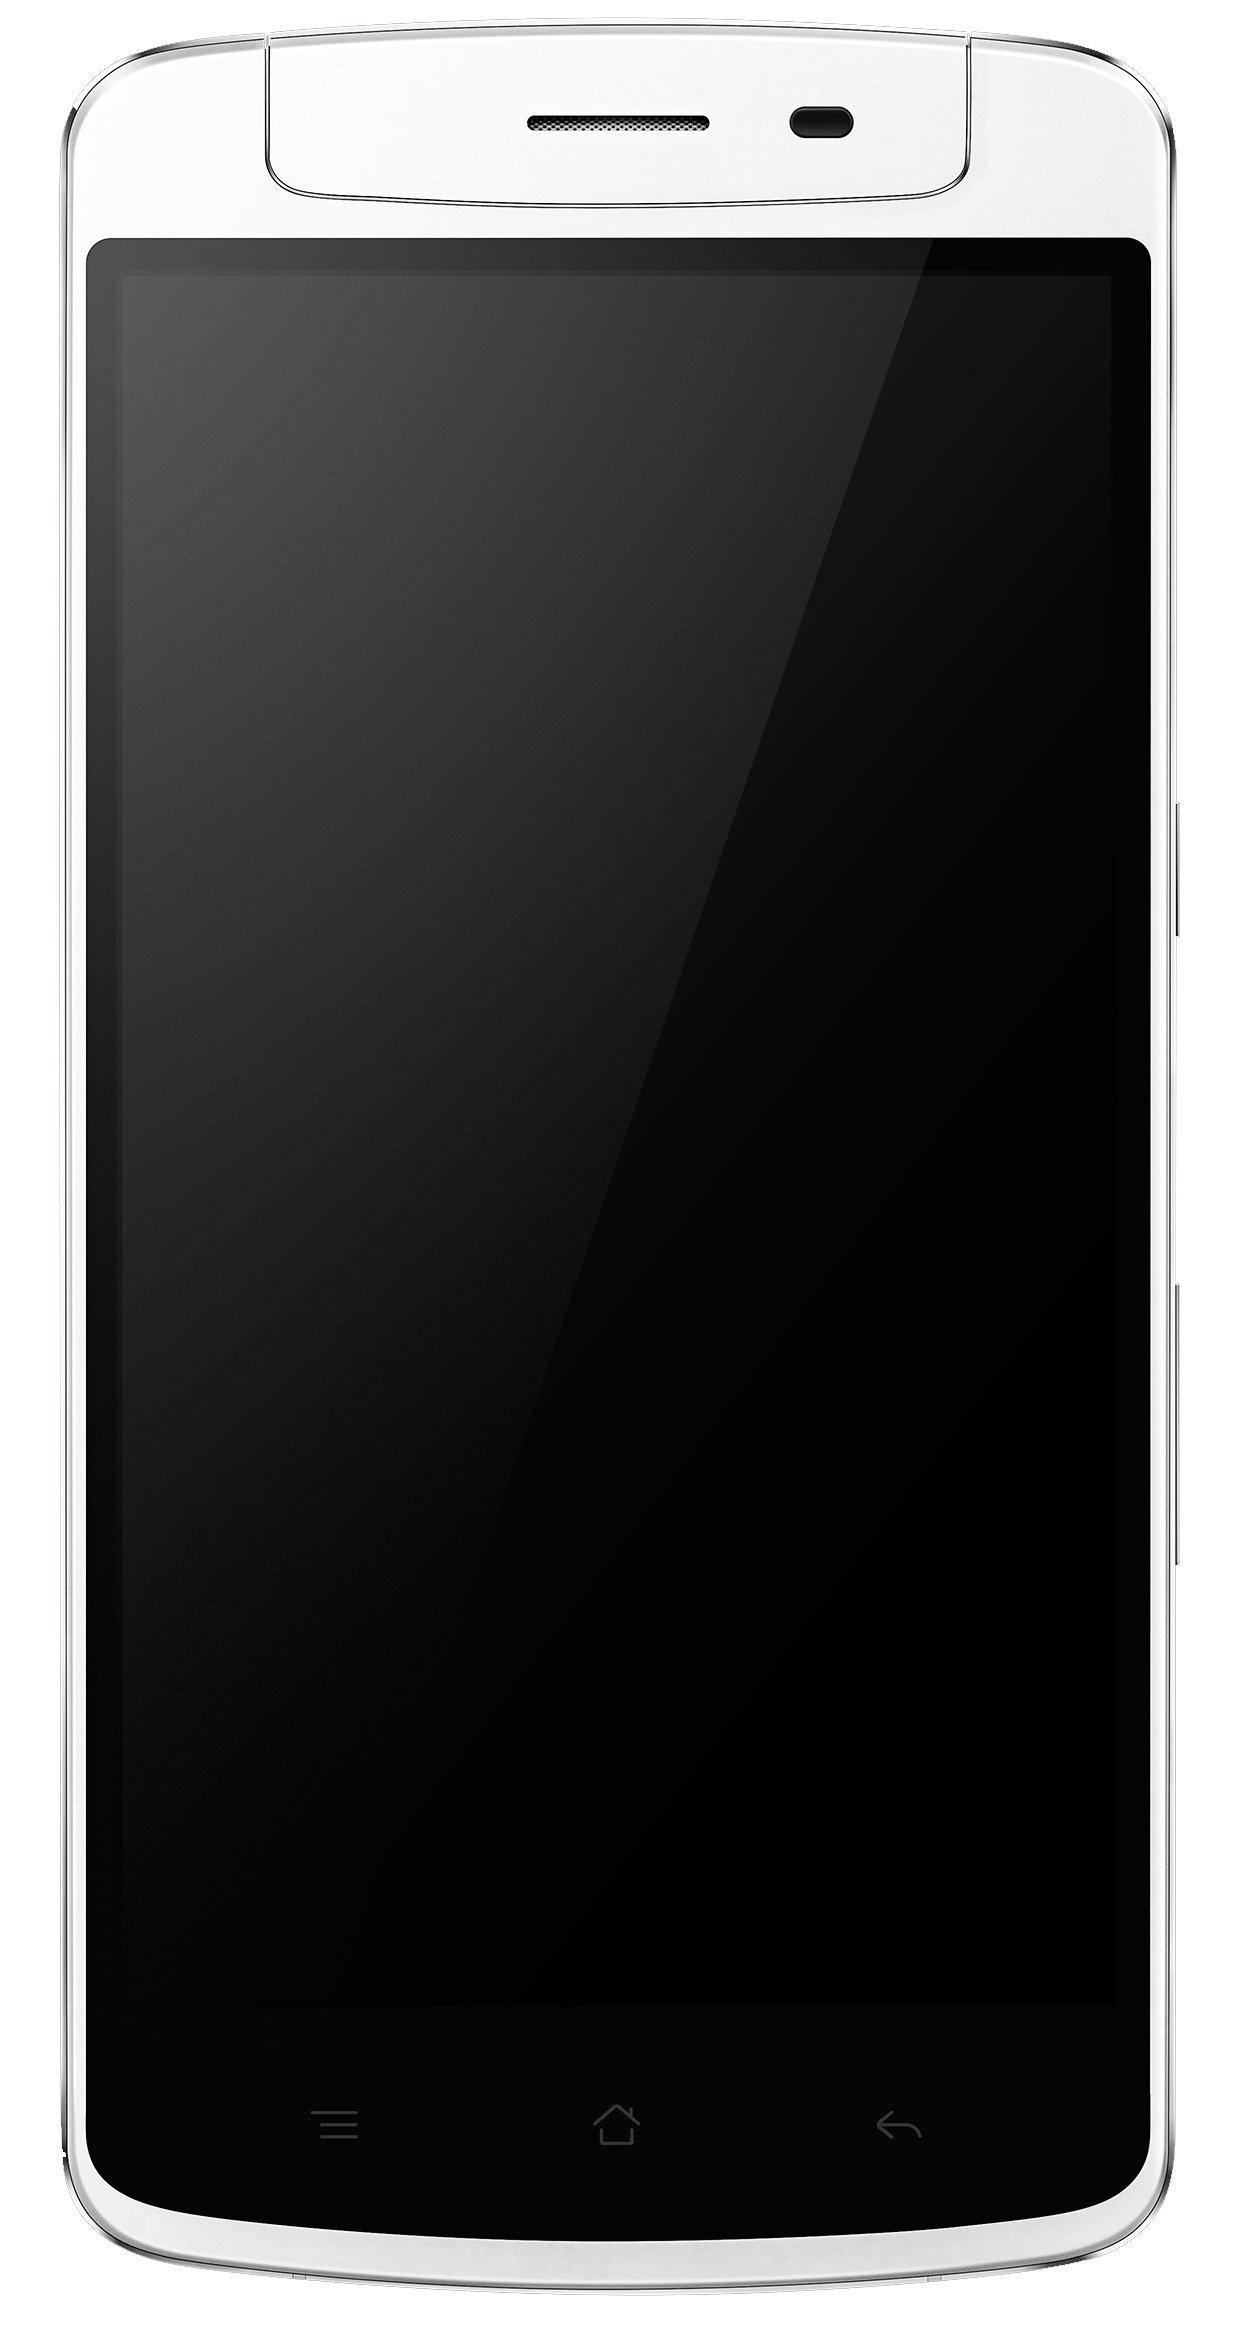 Oppo N1 White 16gb Electronics Hardcase Alumunium Find 5 Mini Gold Riveting Display